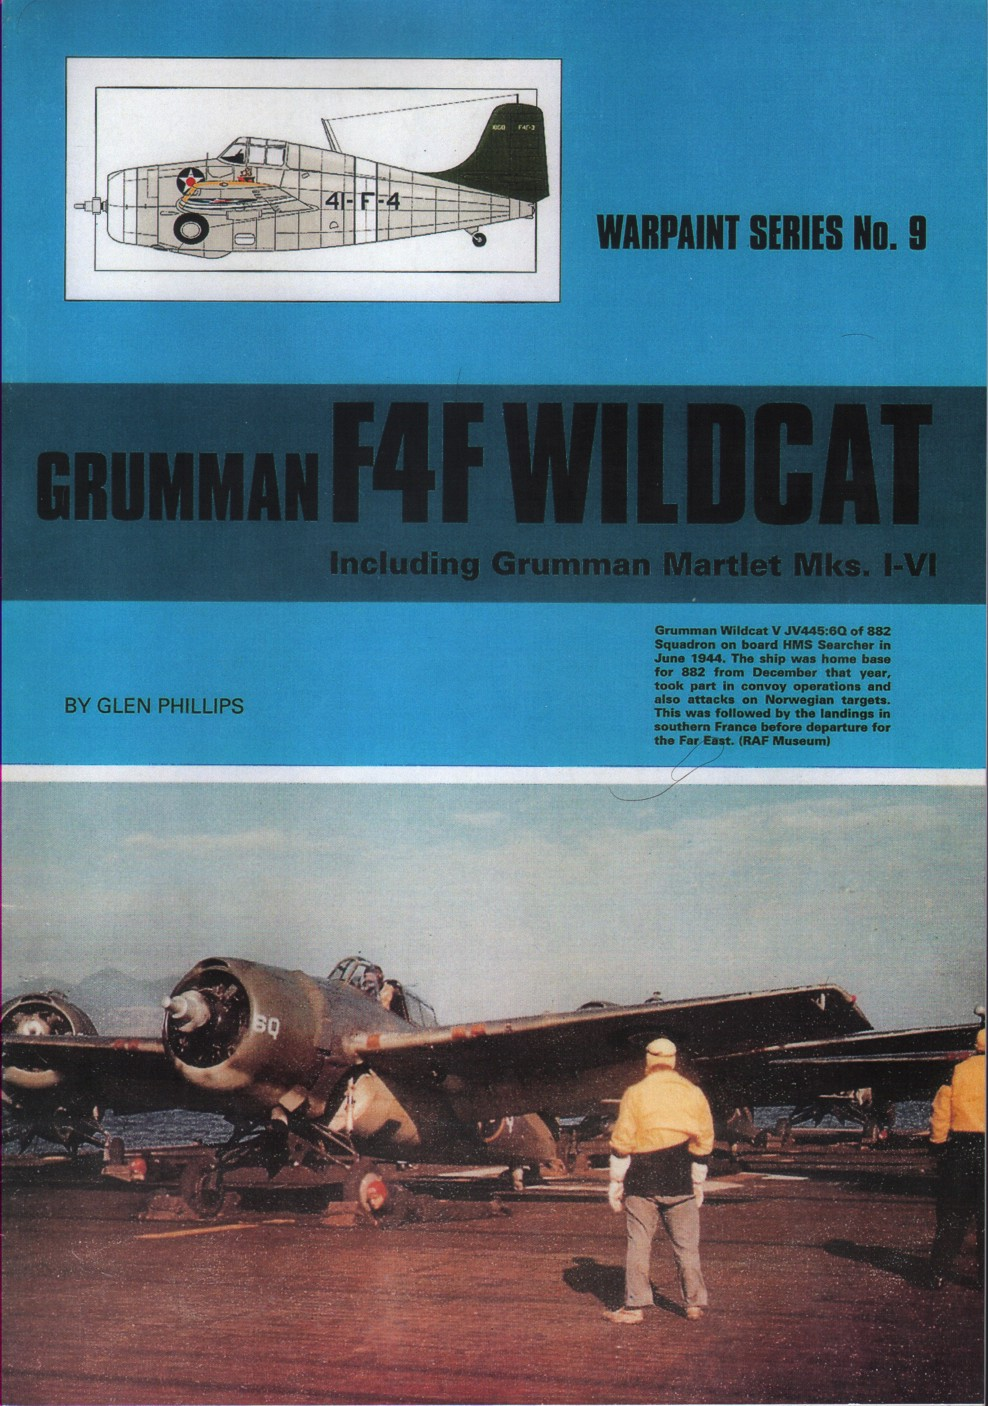 Warpaint Series 9 Grumman F4F Wildcat including Martlet Mk.I/Mk.VI